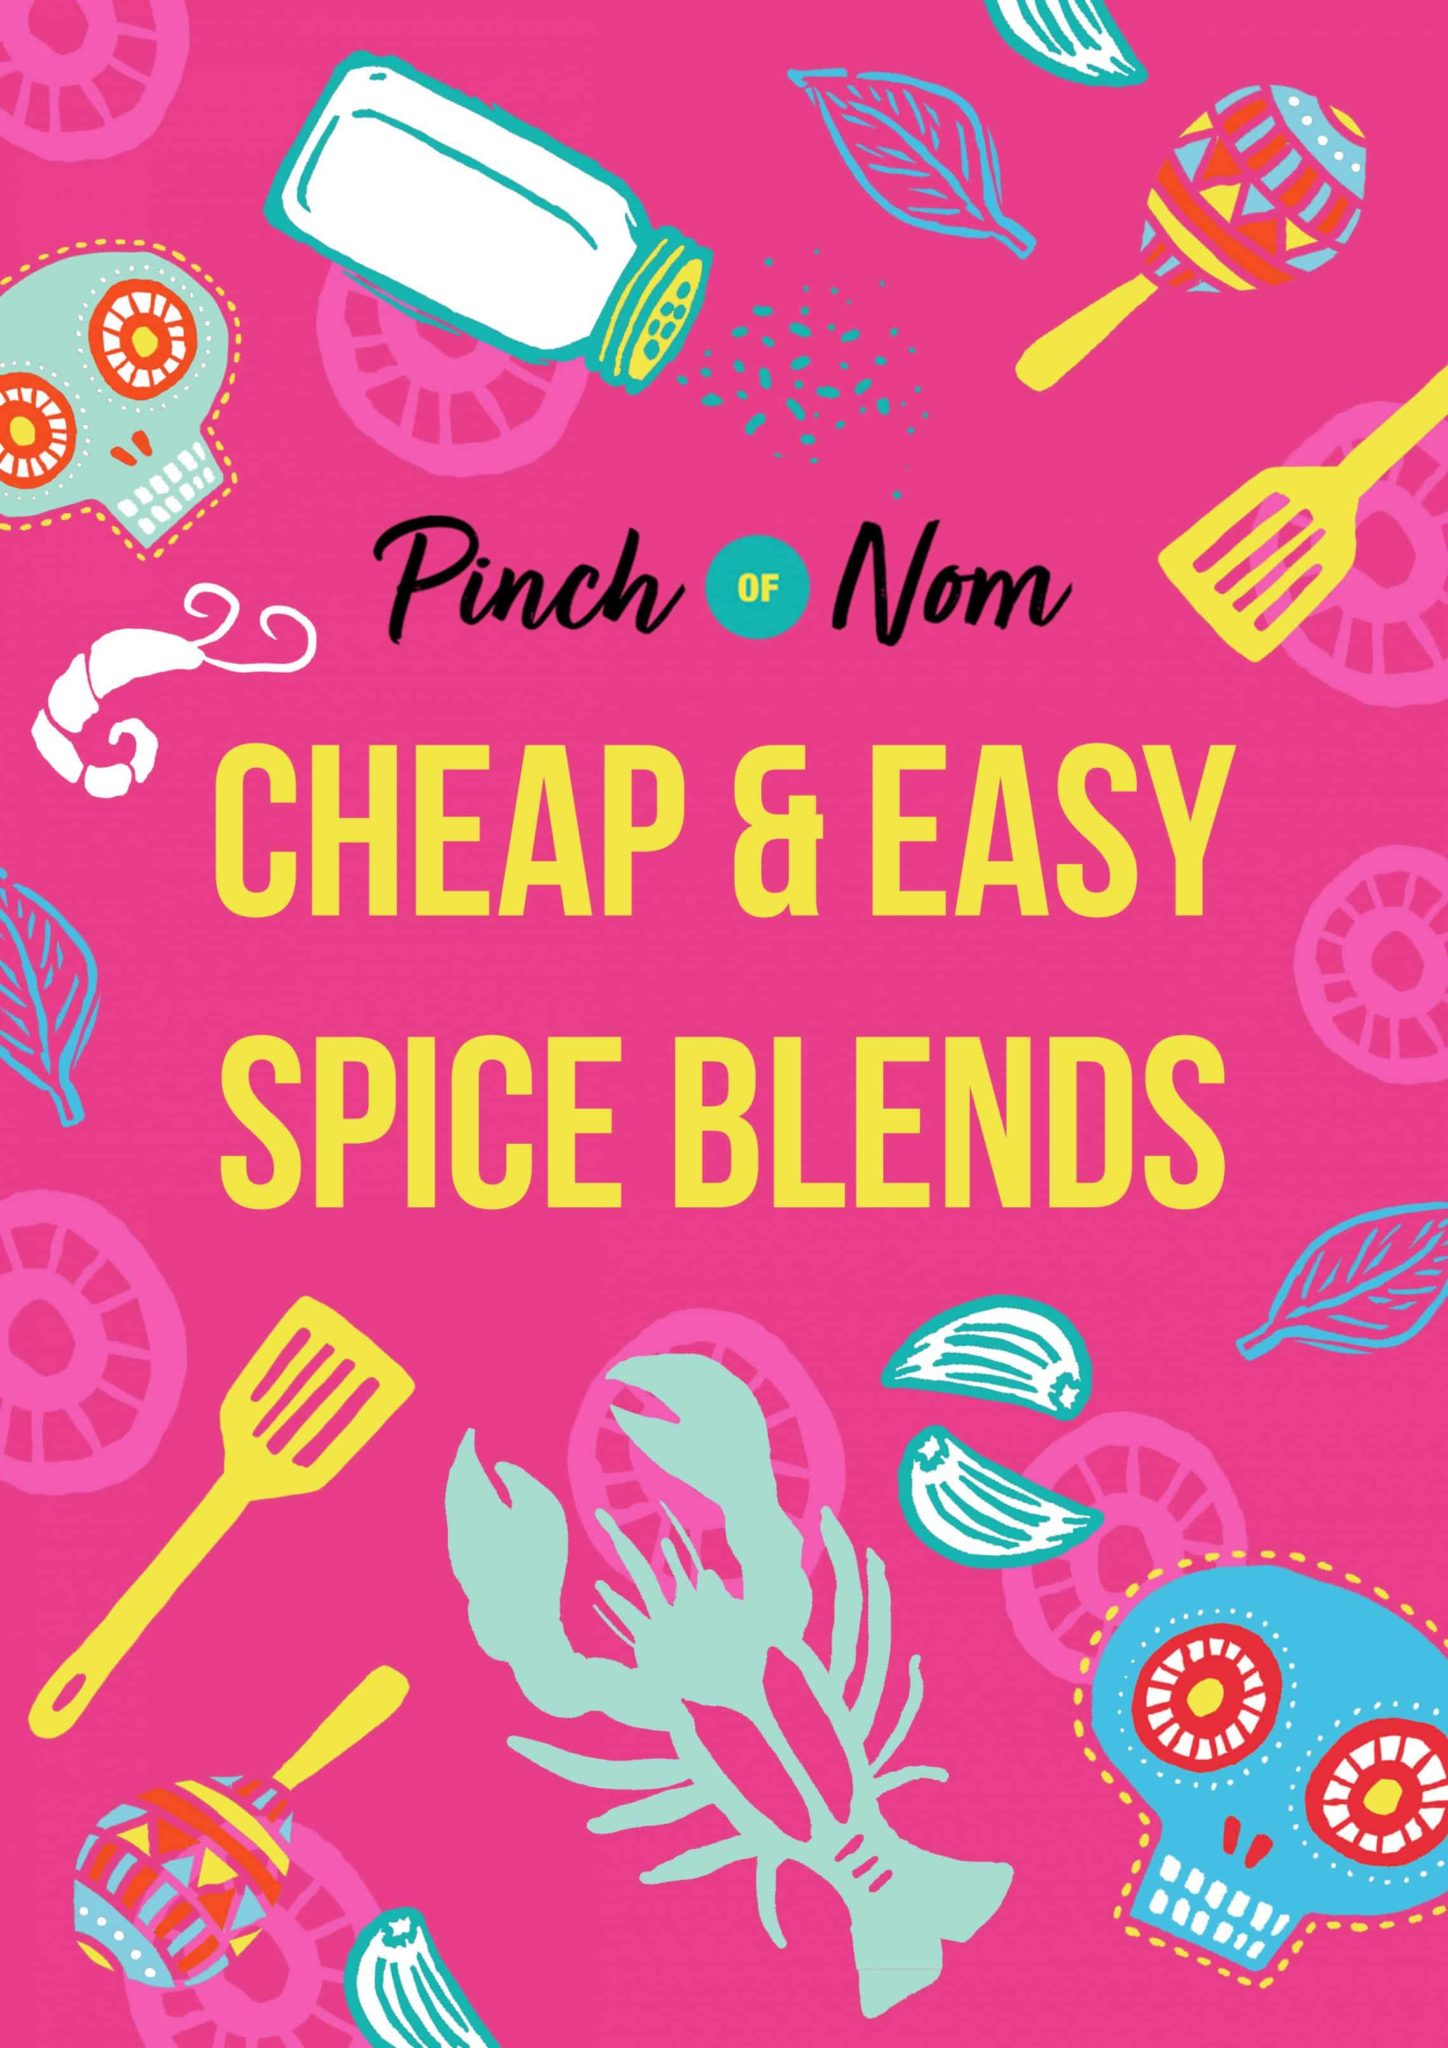 Cheap & Easy Spice Blends pinchofnom.com